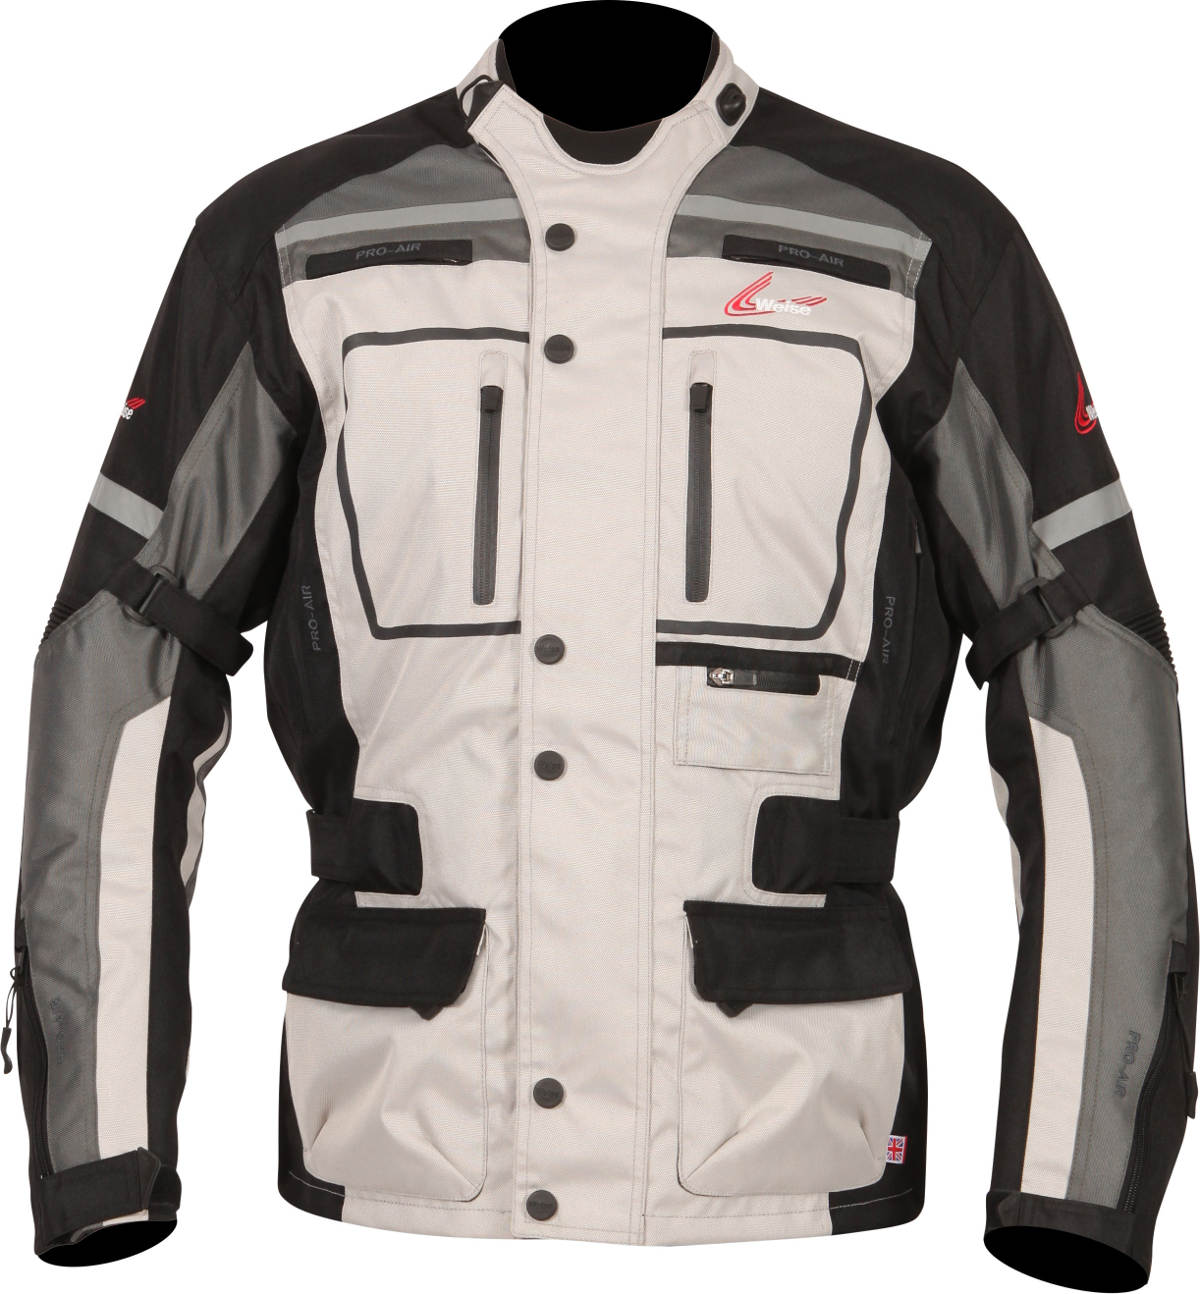 Weise Stuttgart textile Motorcycle Jacket Stone Gun